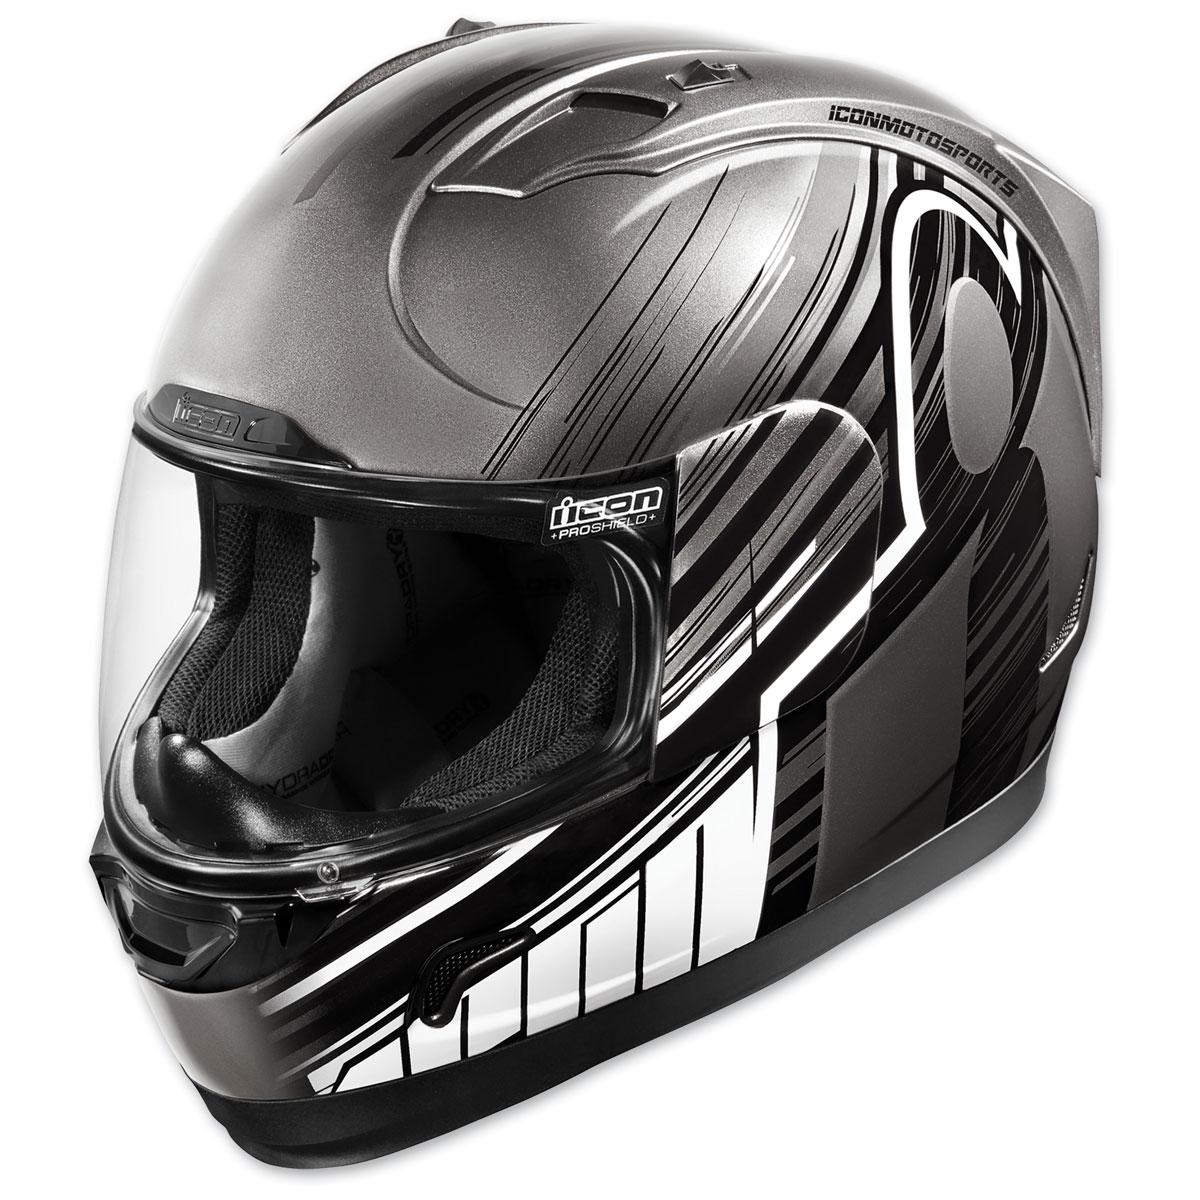 ICON Alliance Overlord Black Full Face Helmet